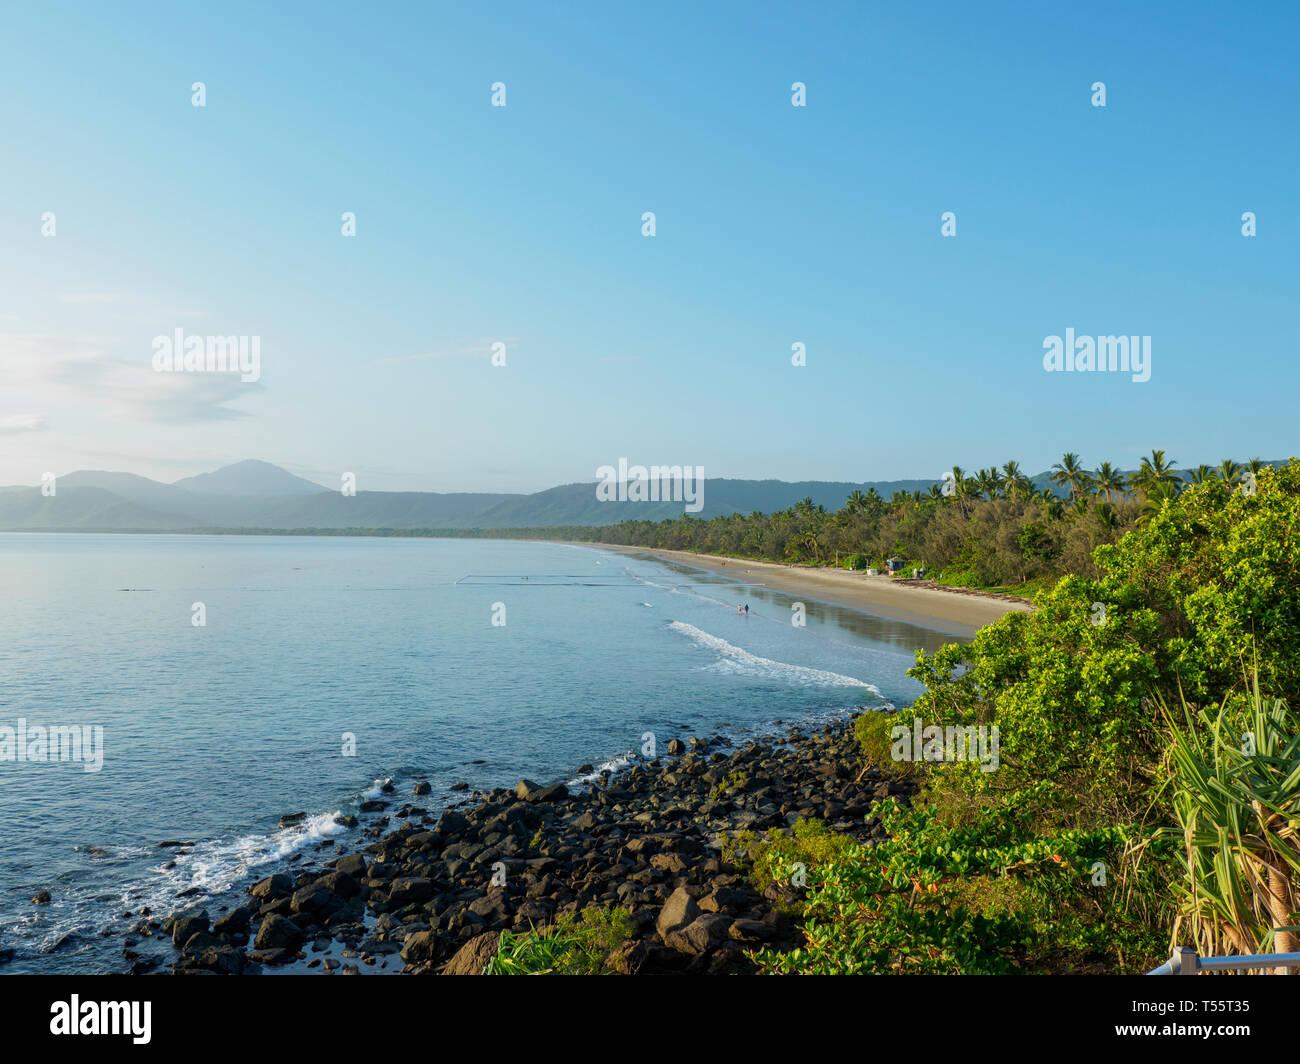 Coastline of Port Douglas, Australia - Stock Image